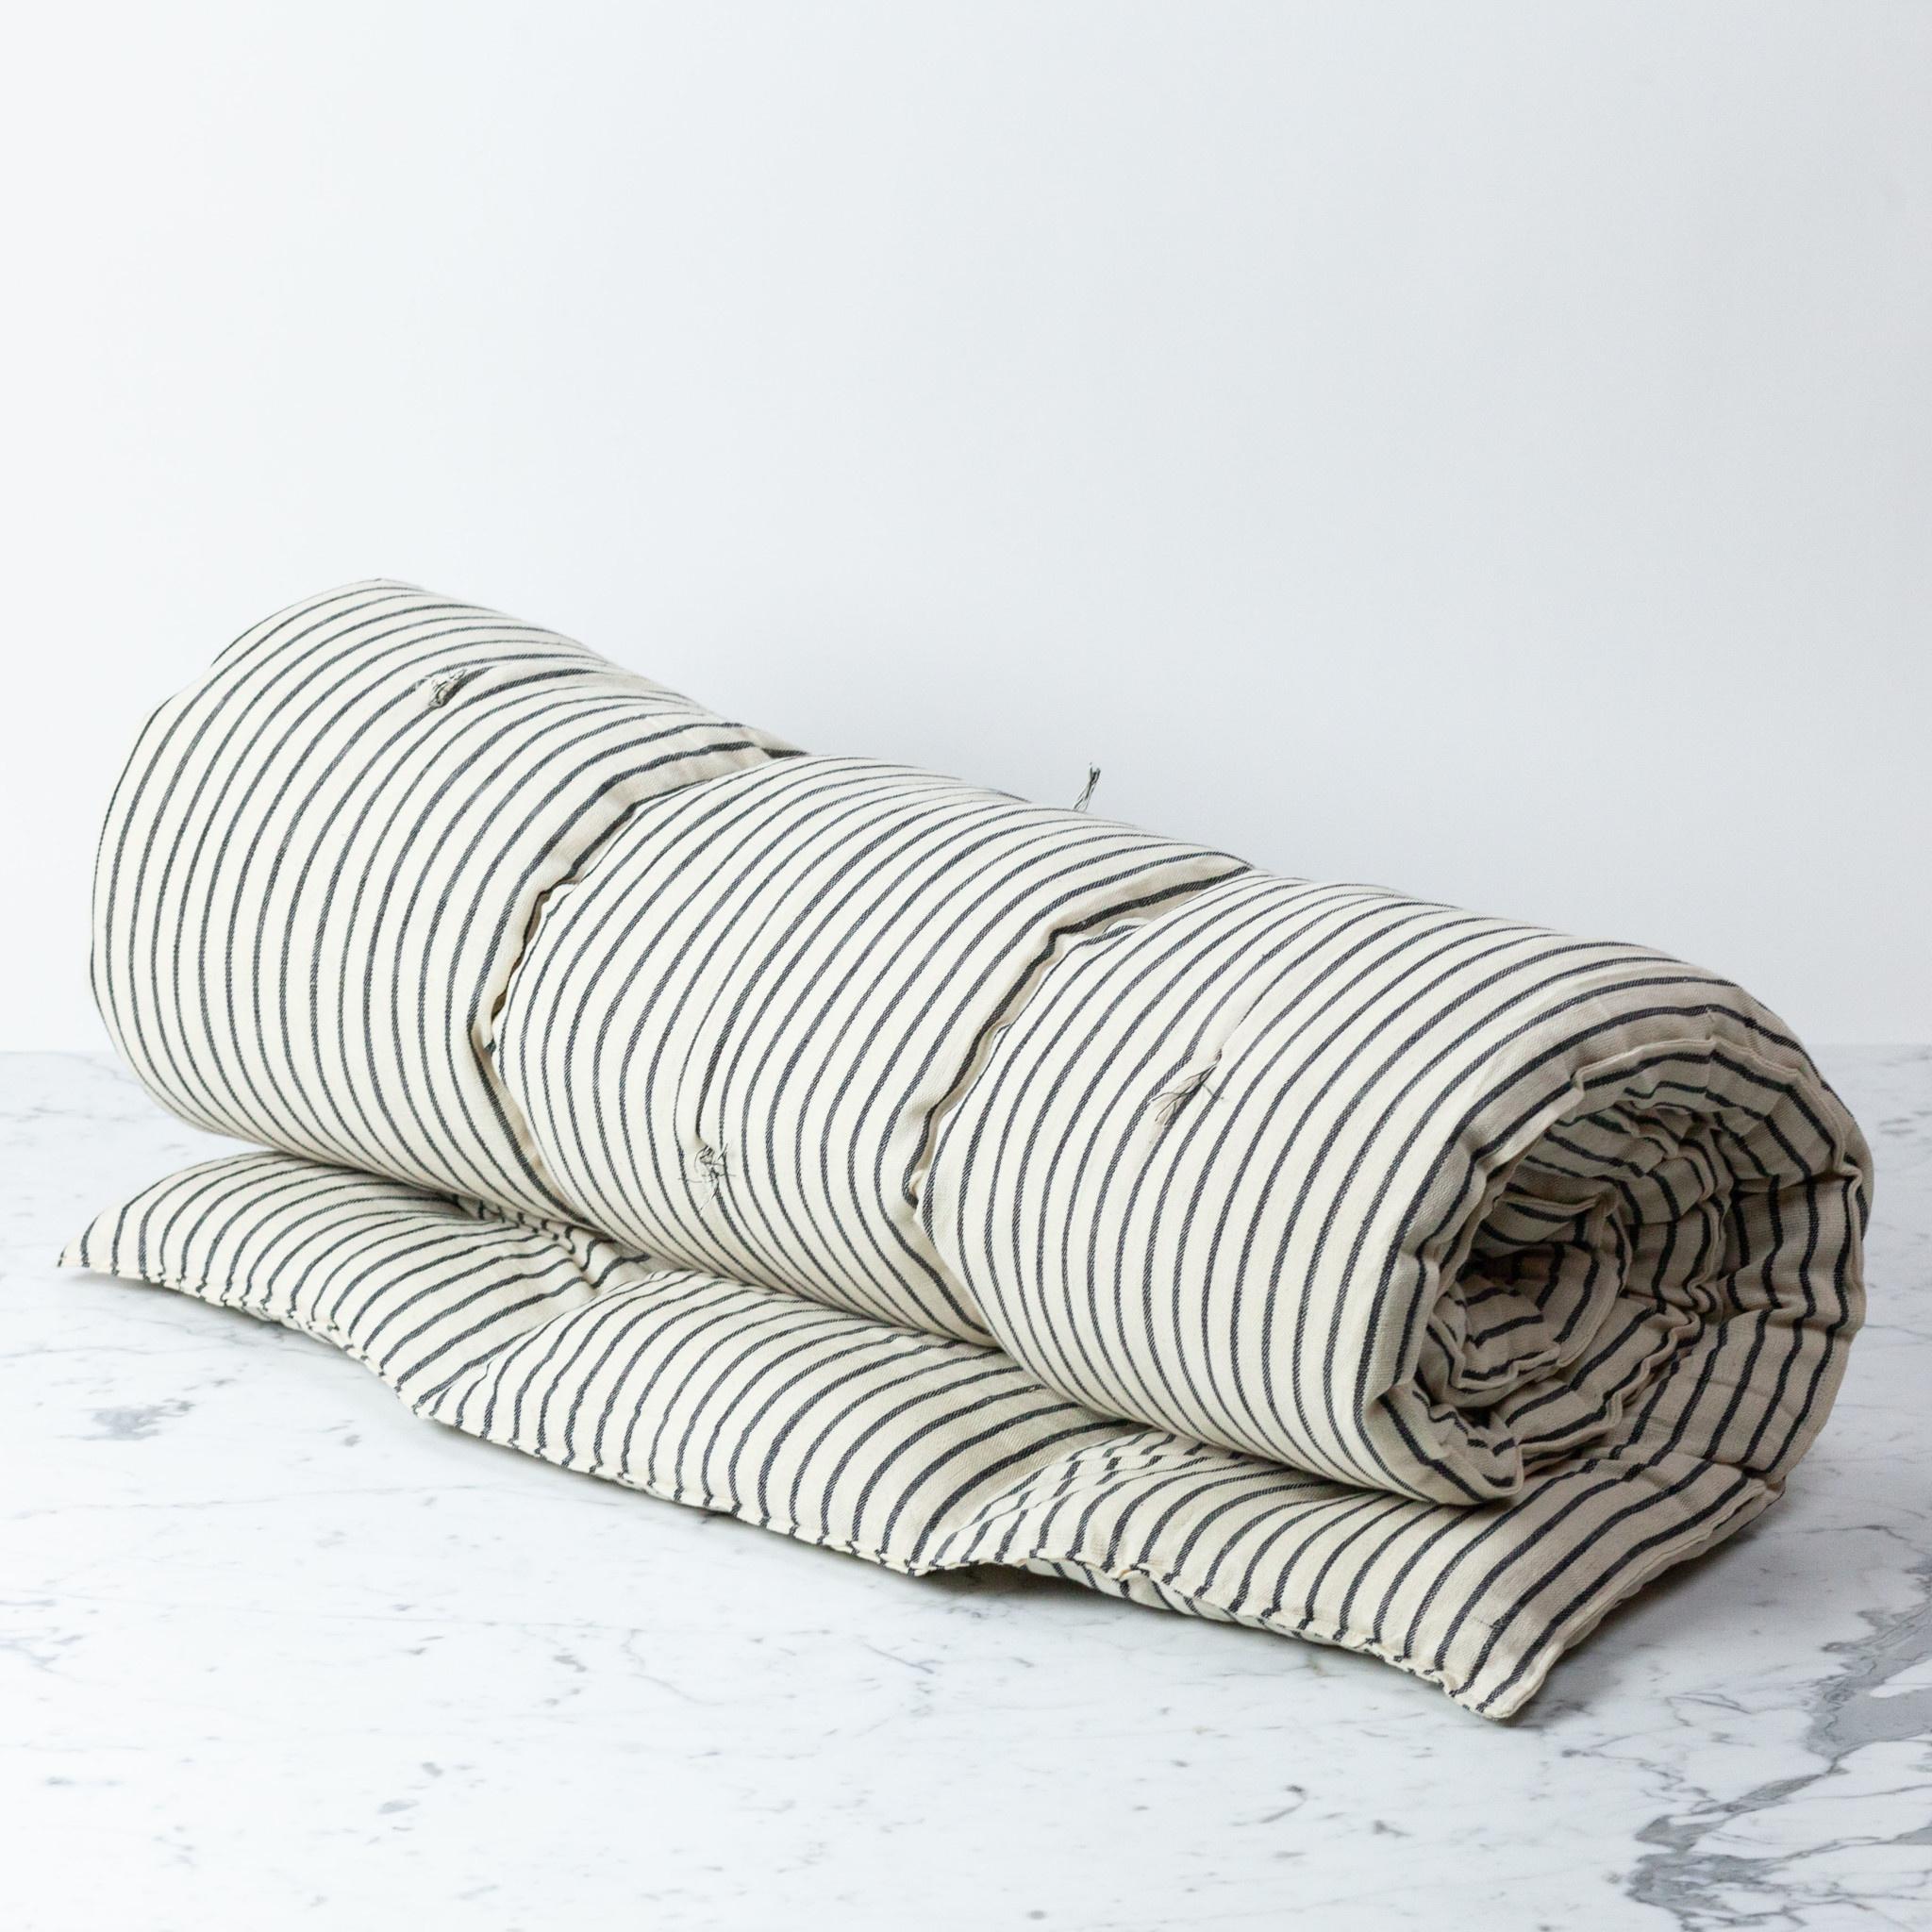 TENSIRA Handwoven Cotton Twin Size Bedroll - Off White with Slim Regular Black Stripe - 40 x 75 inch